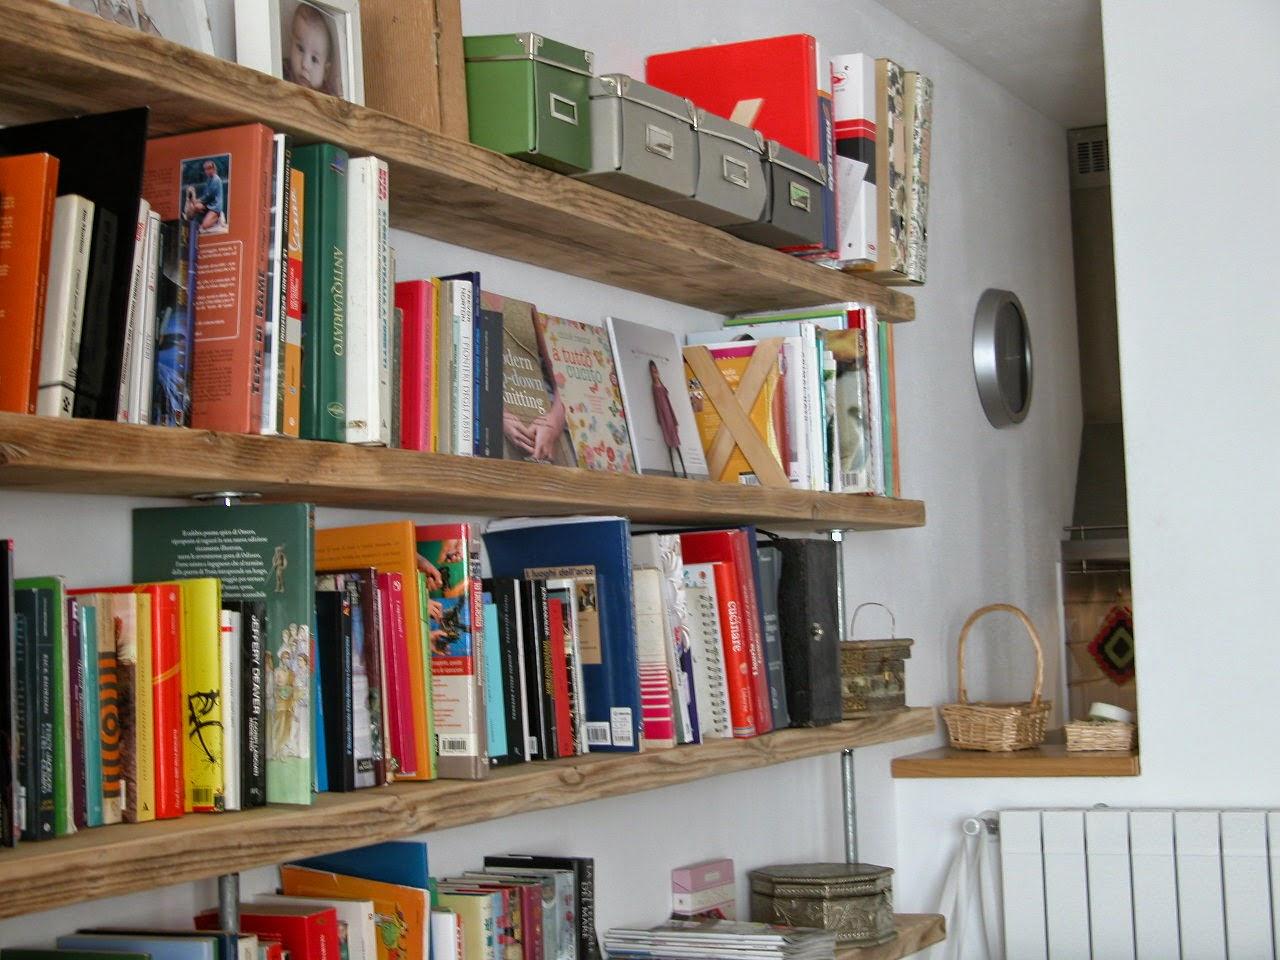 Lavoralalana libreria o ponteggio for Libreria fai da te